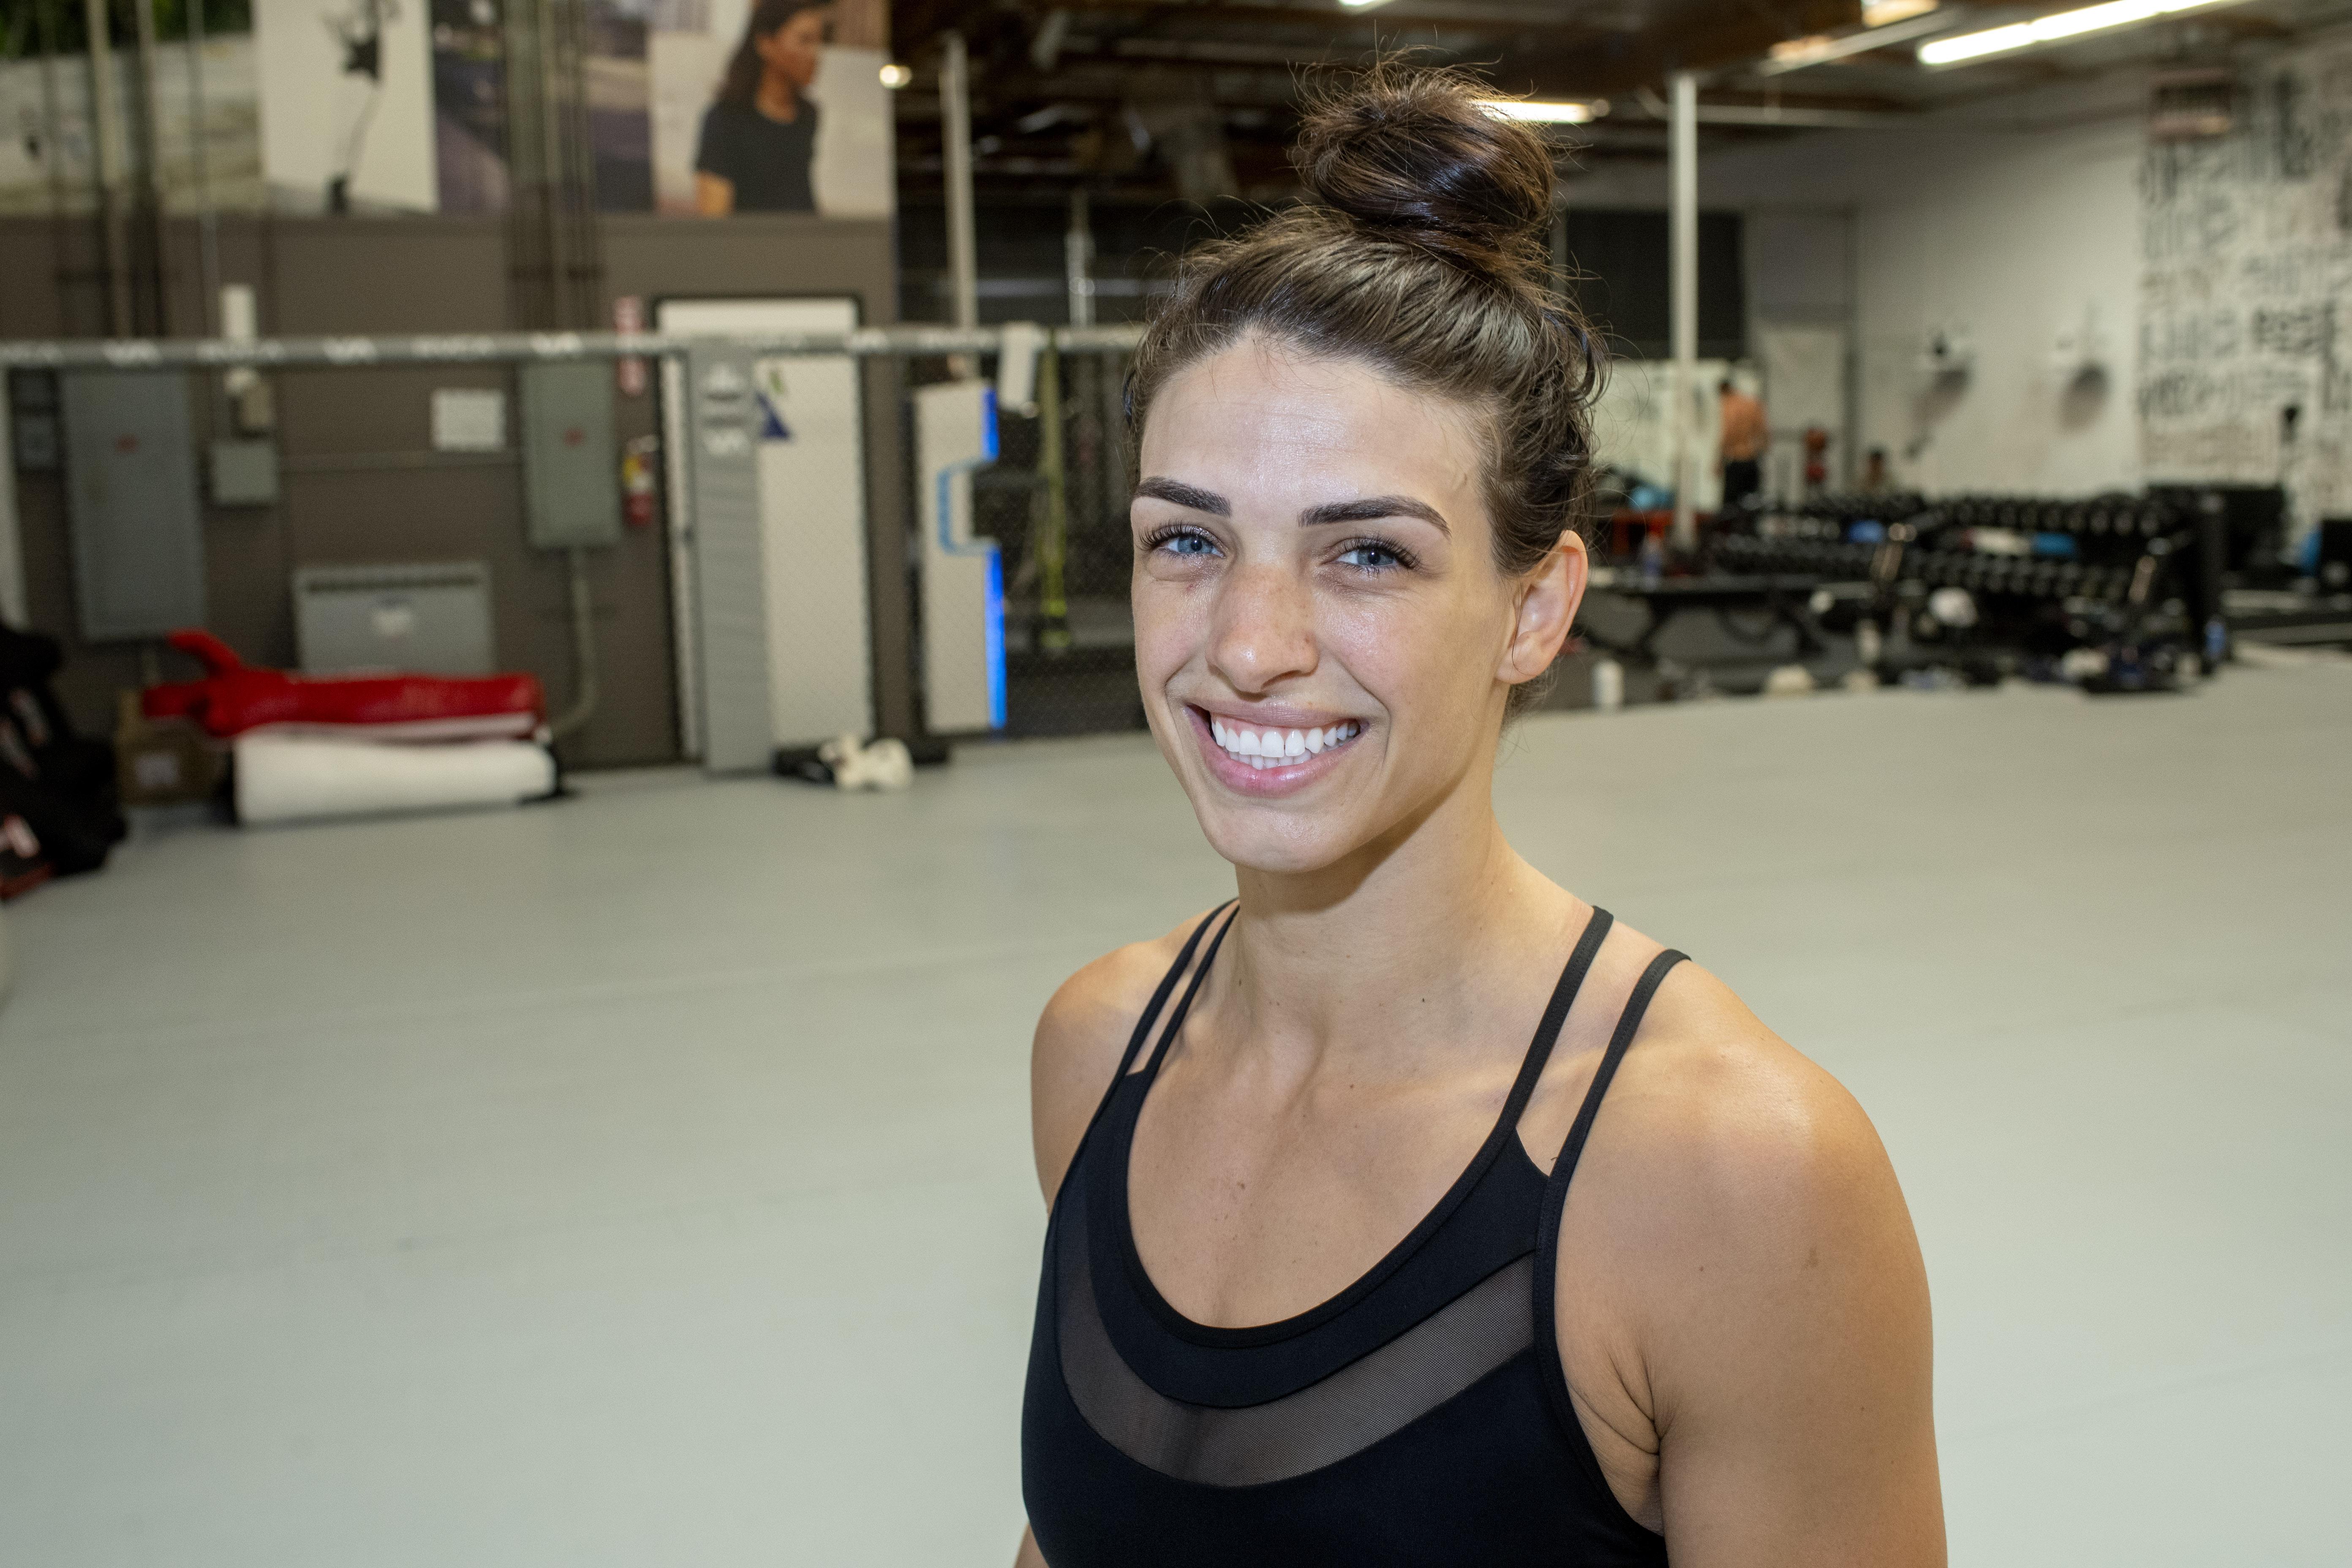 Mackenzie Dern is set to face Marina Rodriguez on October 9.